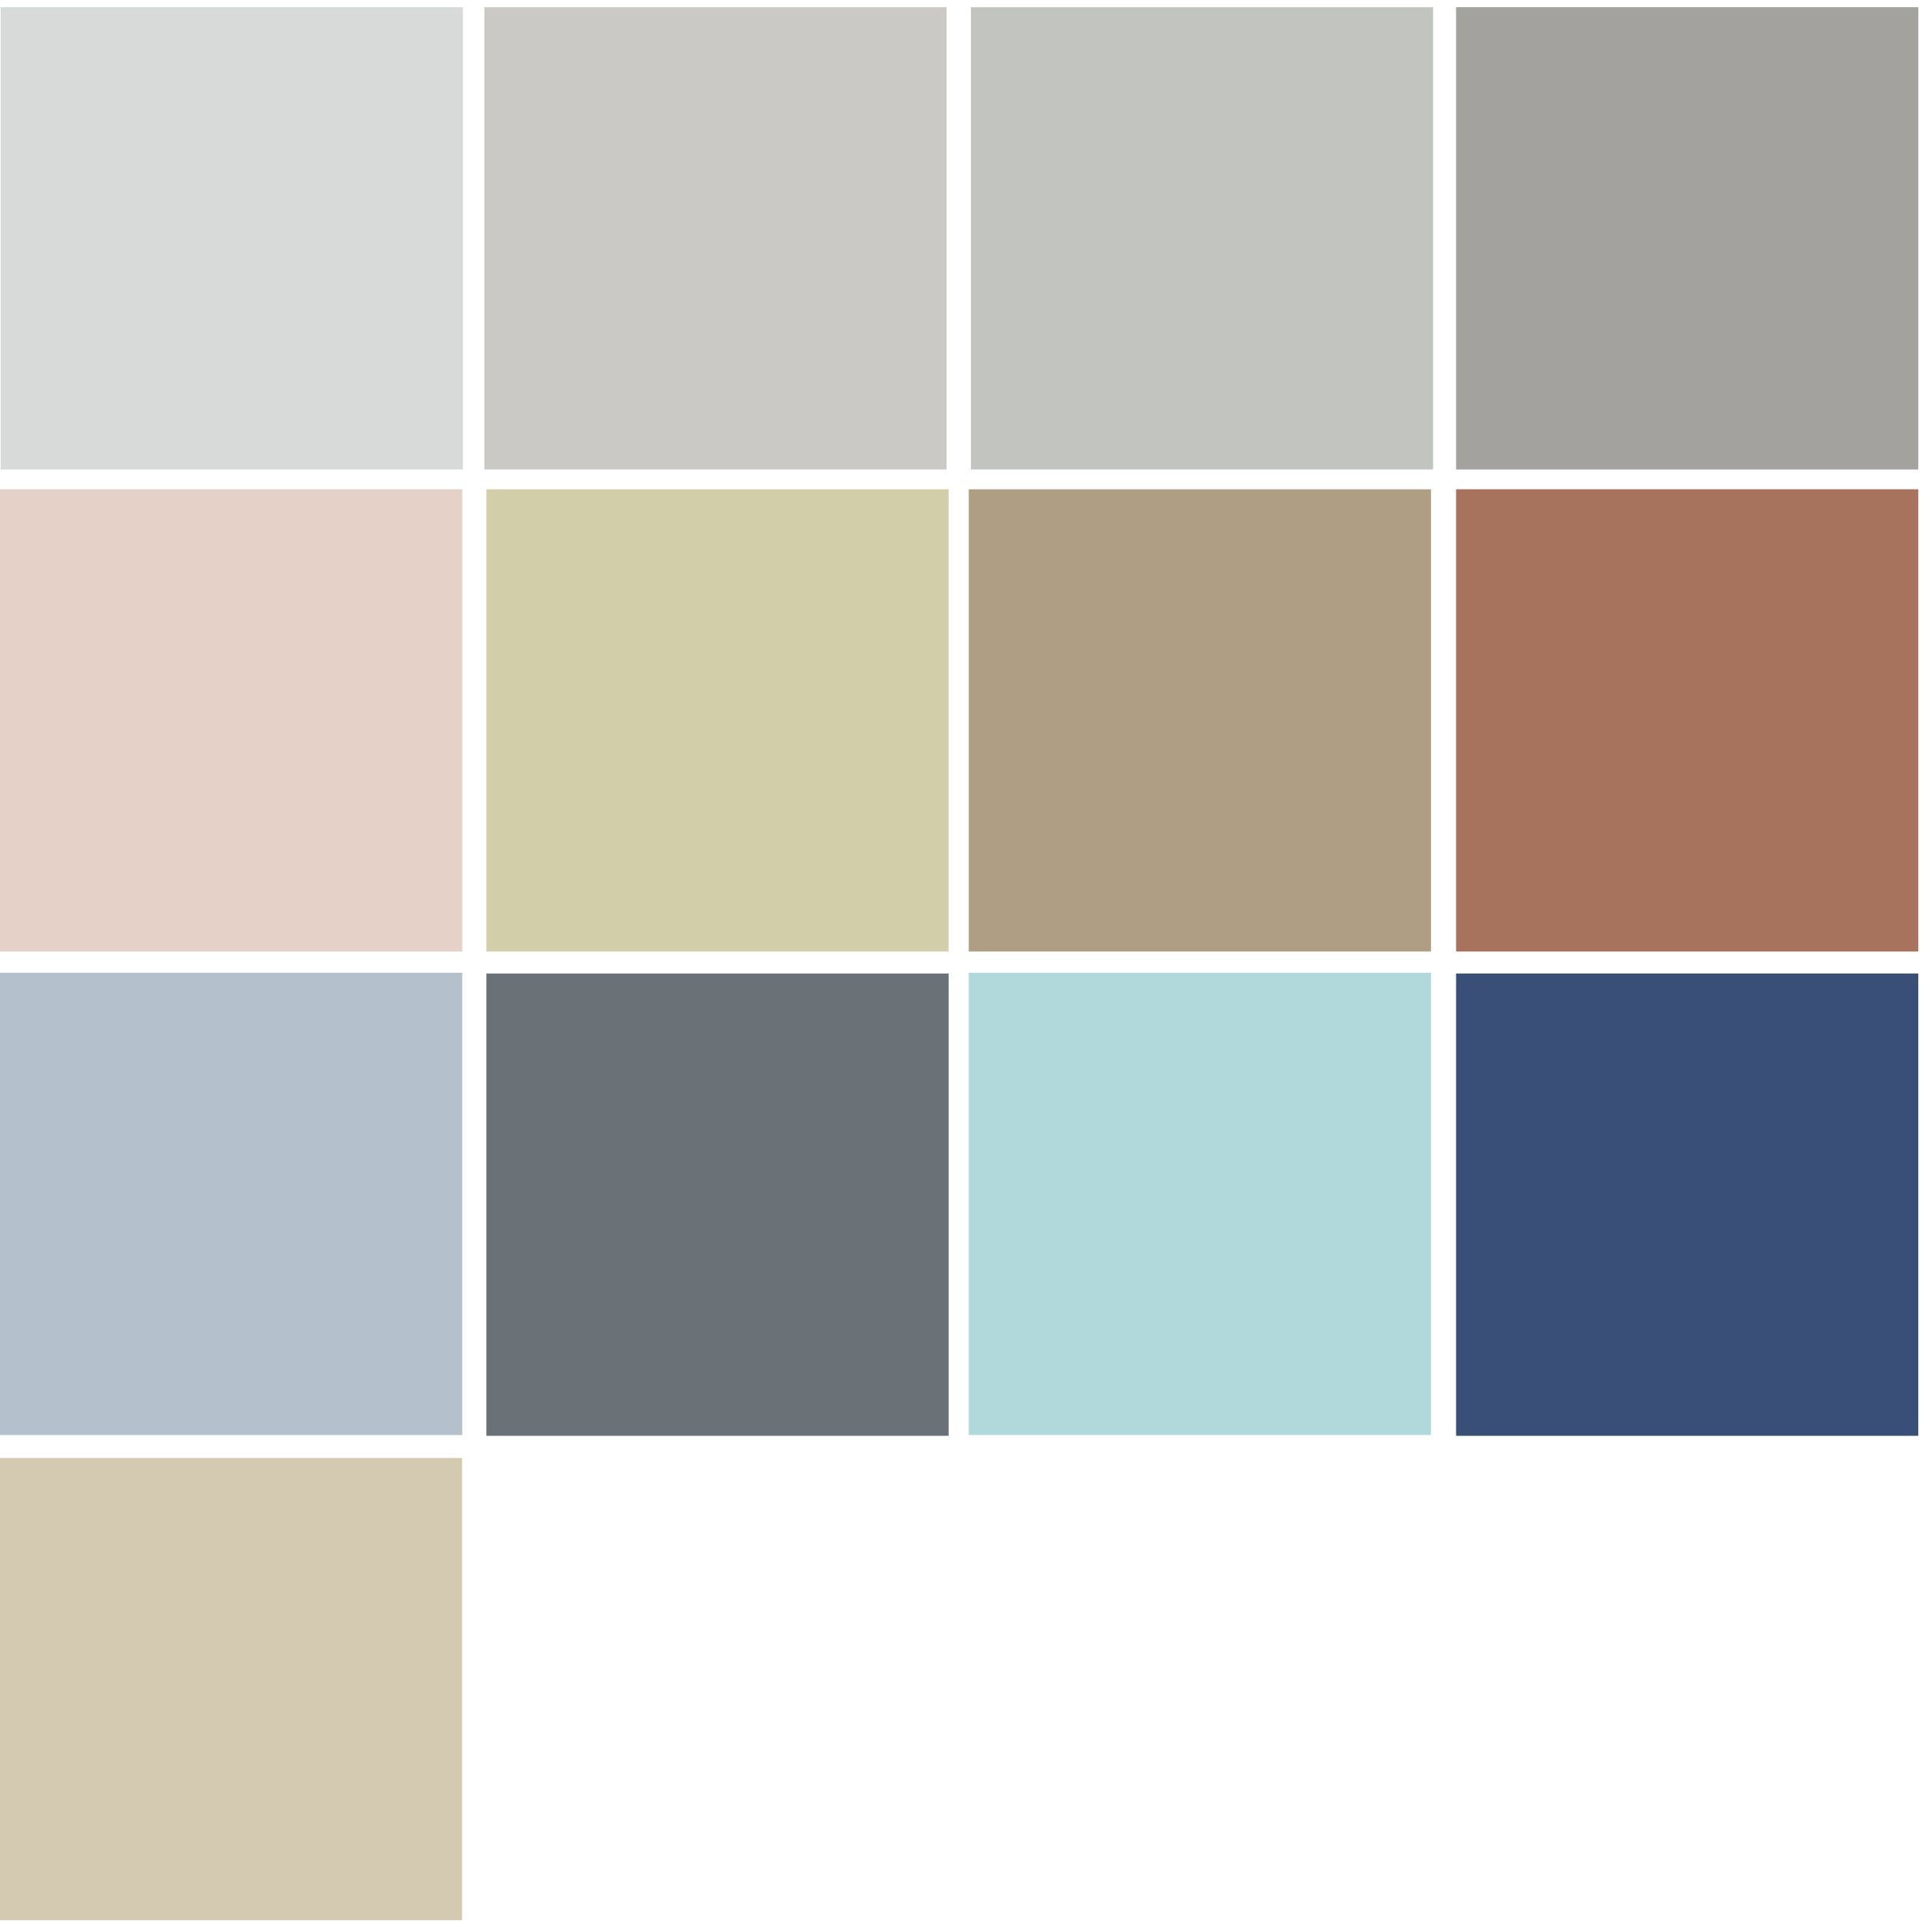 4 color trends 2018 by dulux essential palette via. Black Bedroom Furniture Sets. Home Design Ideas